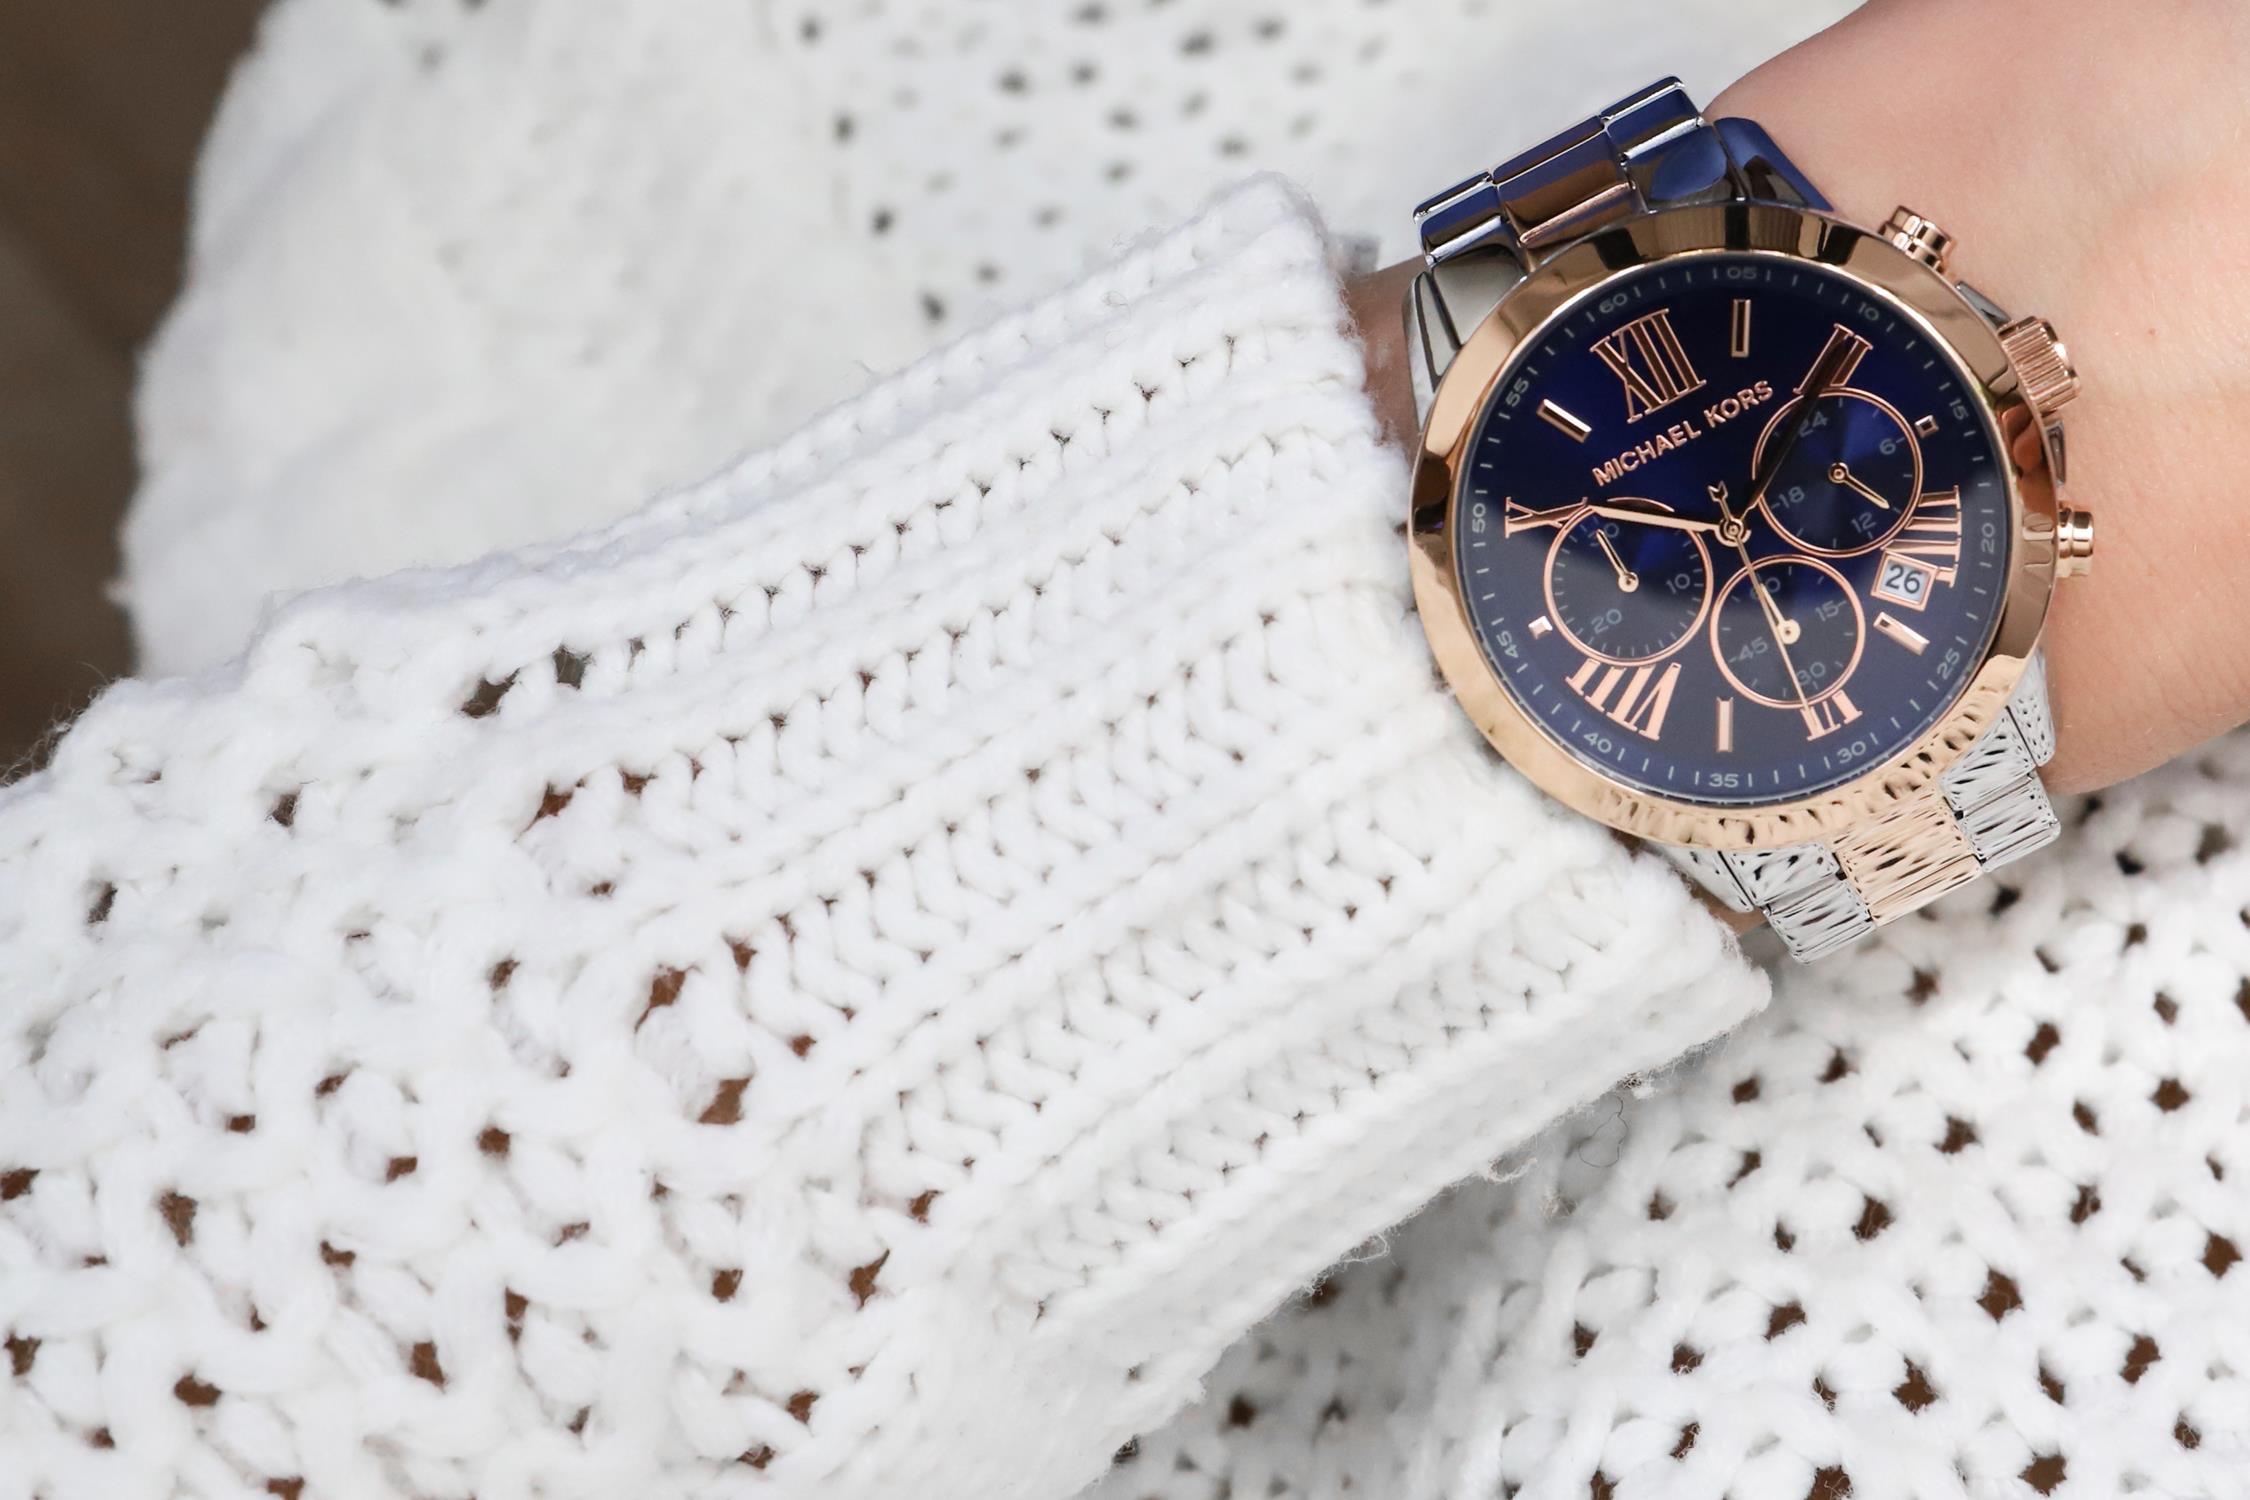 zegarek Michael Kors MK6389 kwarcowy damski Bradshaw BRADSHAW